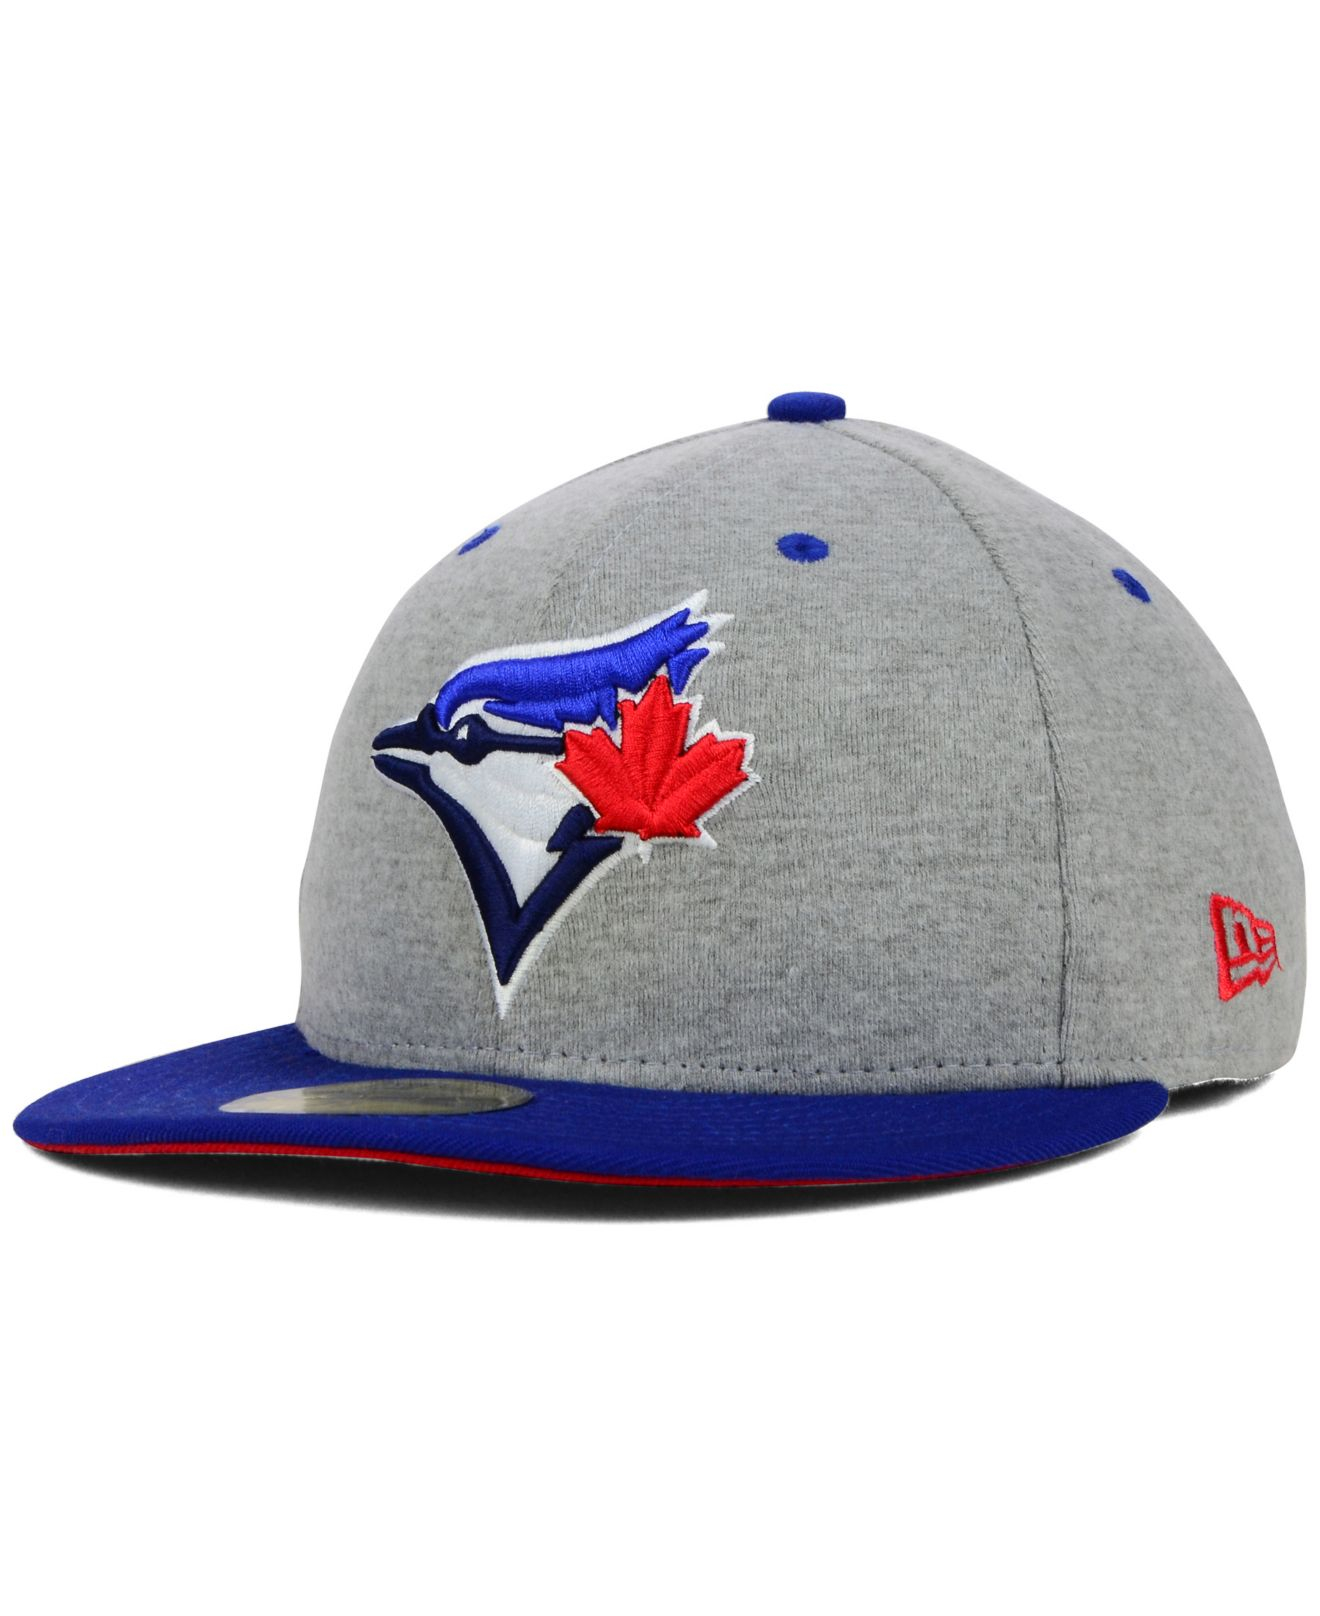 new style 50048 25874 Lyst - KTZ Toronto Blue Jays Sweat Team Pop 59Fifty Cap in Gray for Men